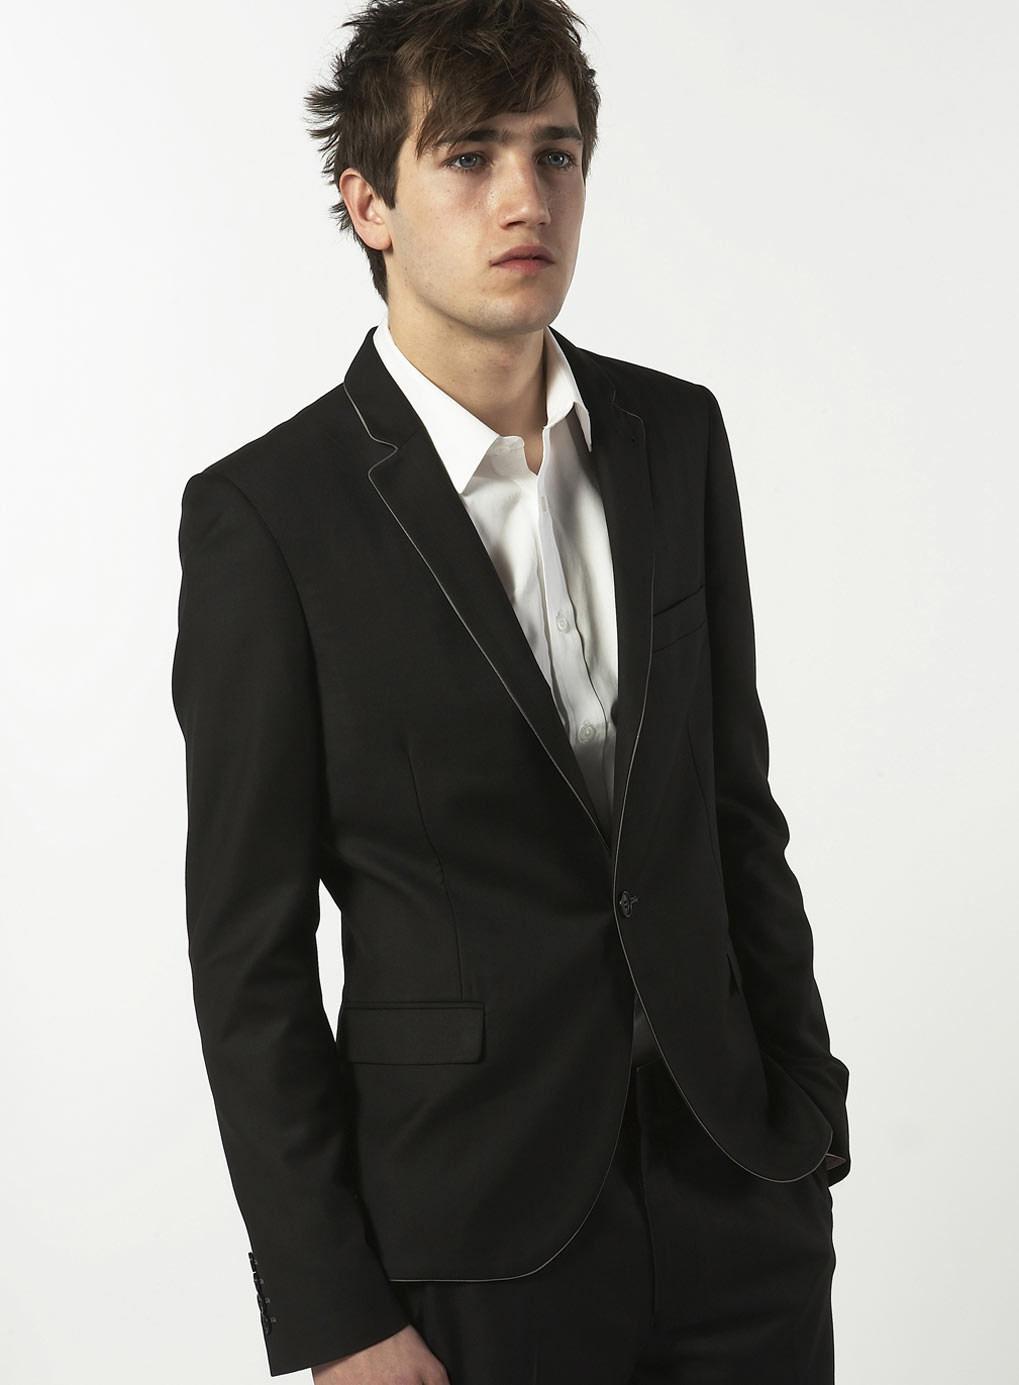 interview clothes for men